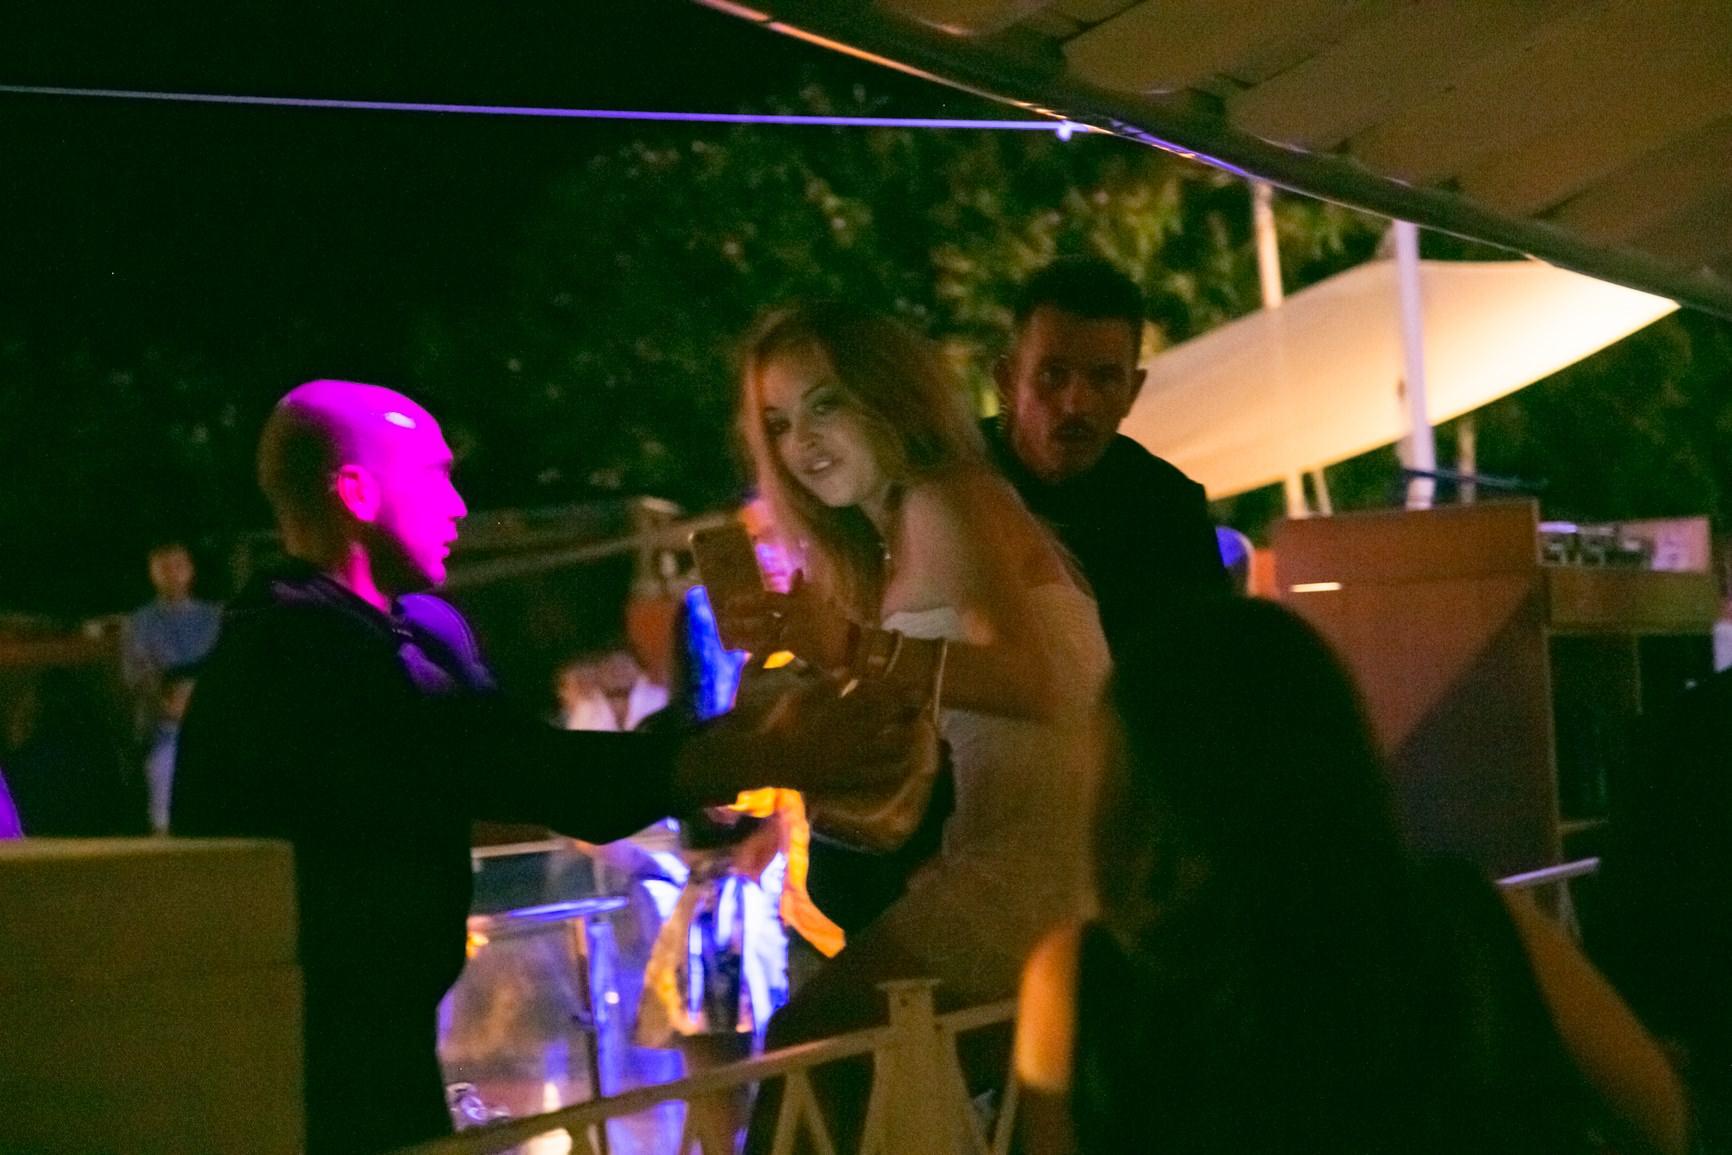 Serata al Twiga per la star americana Lindsay Lohan